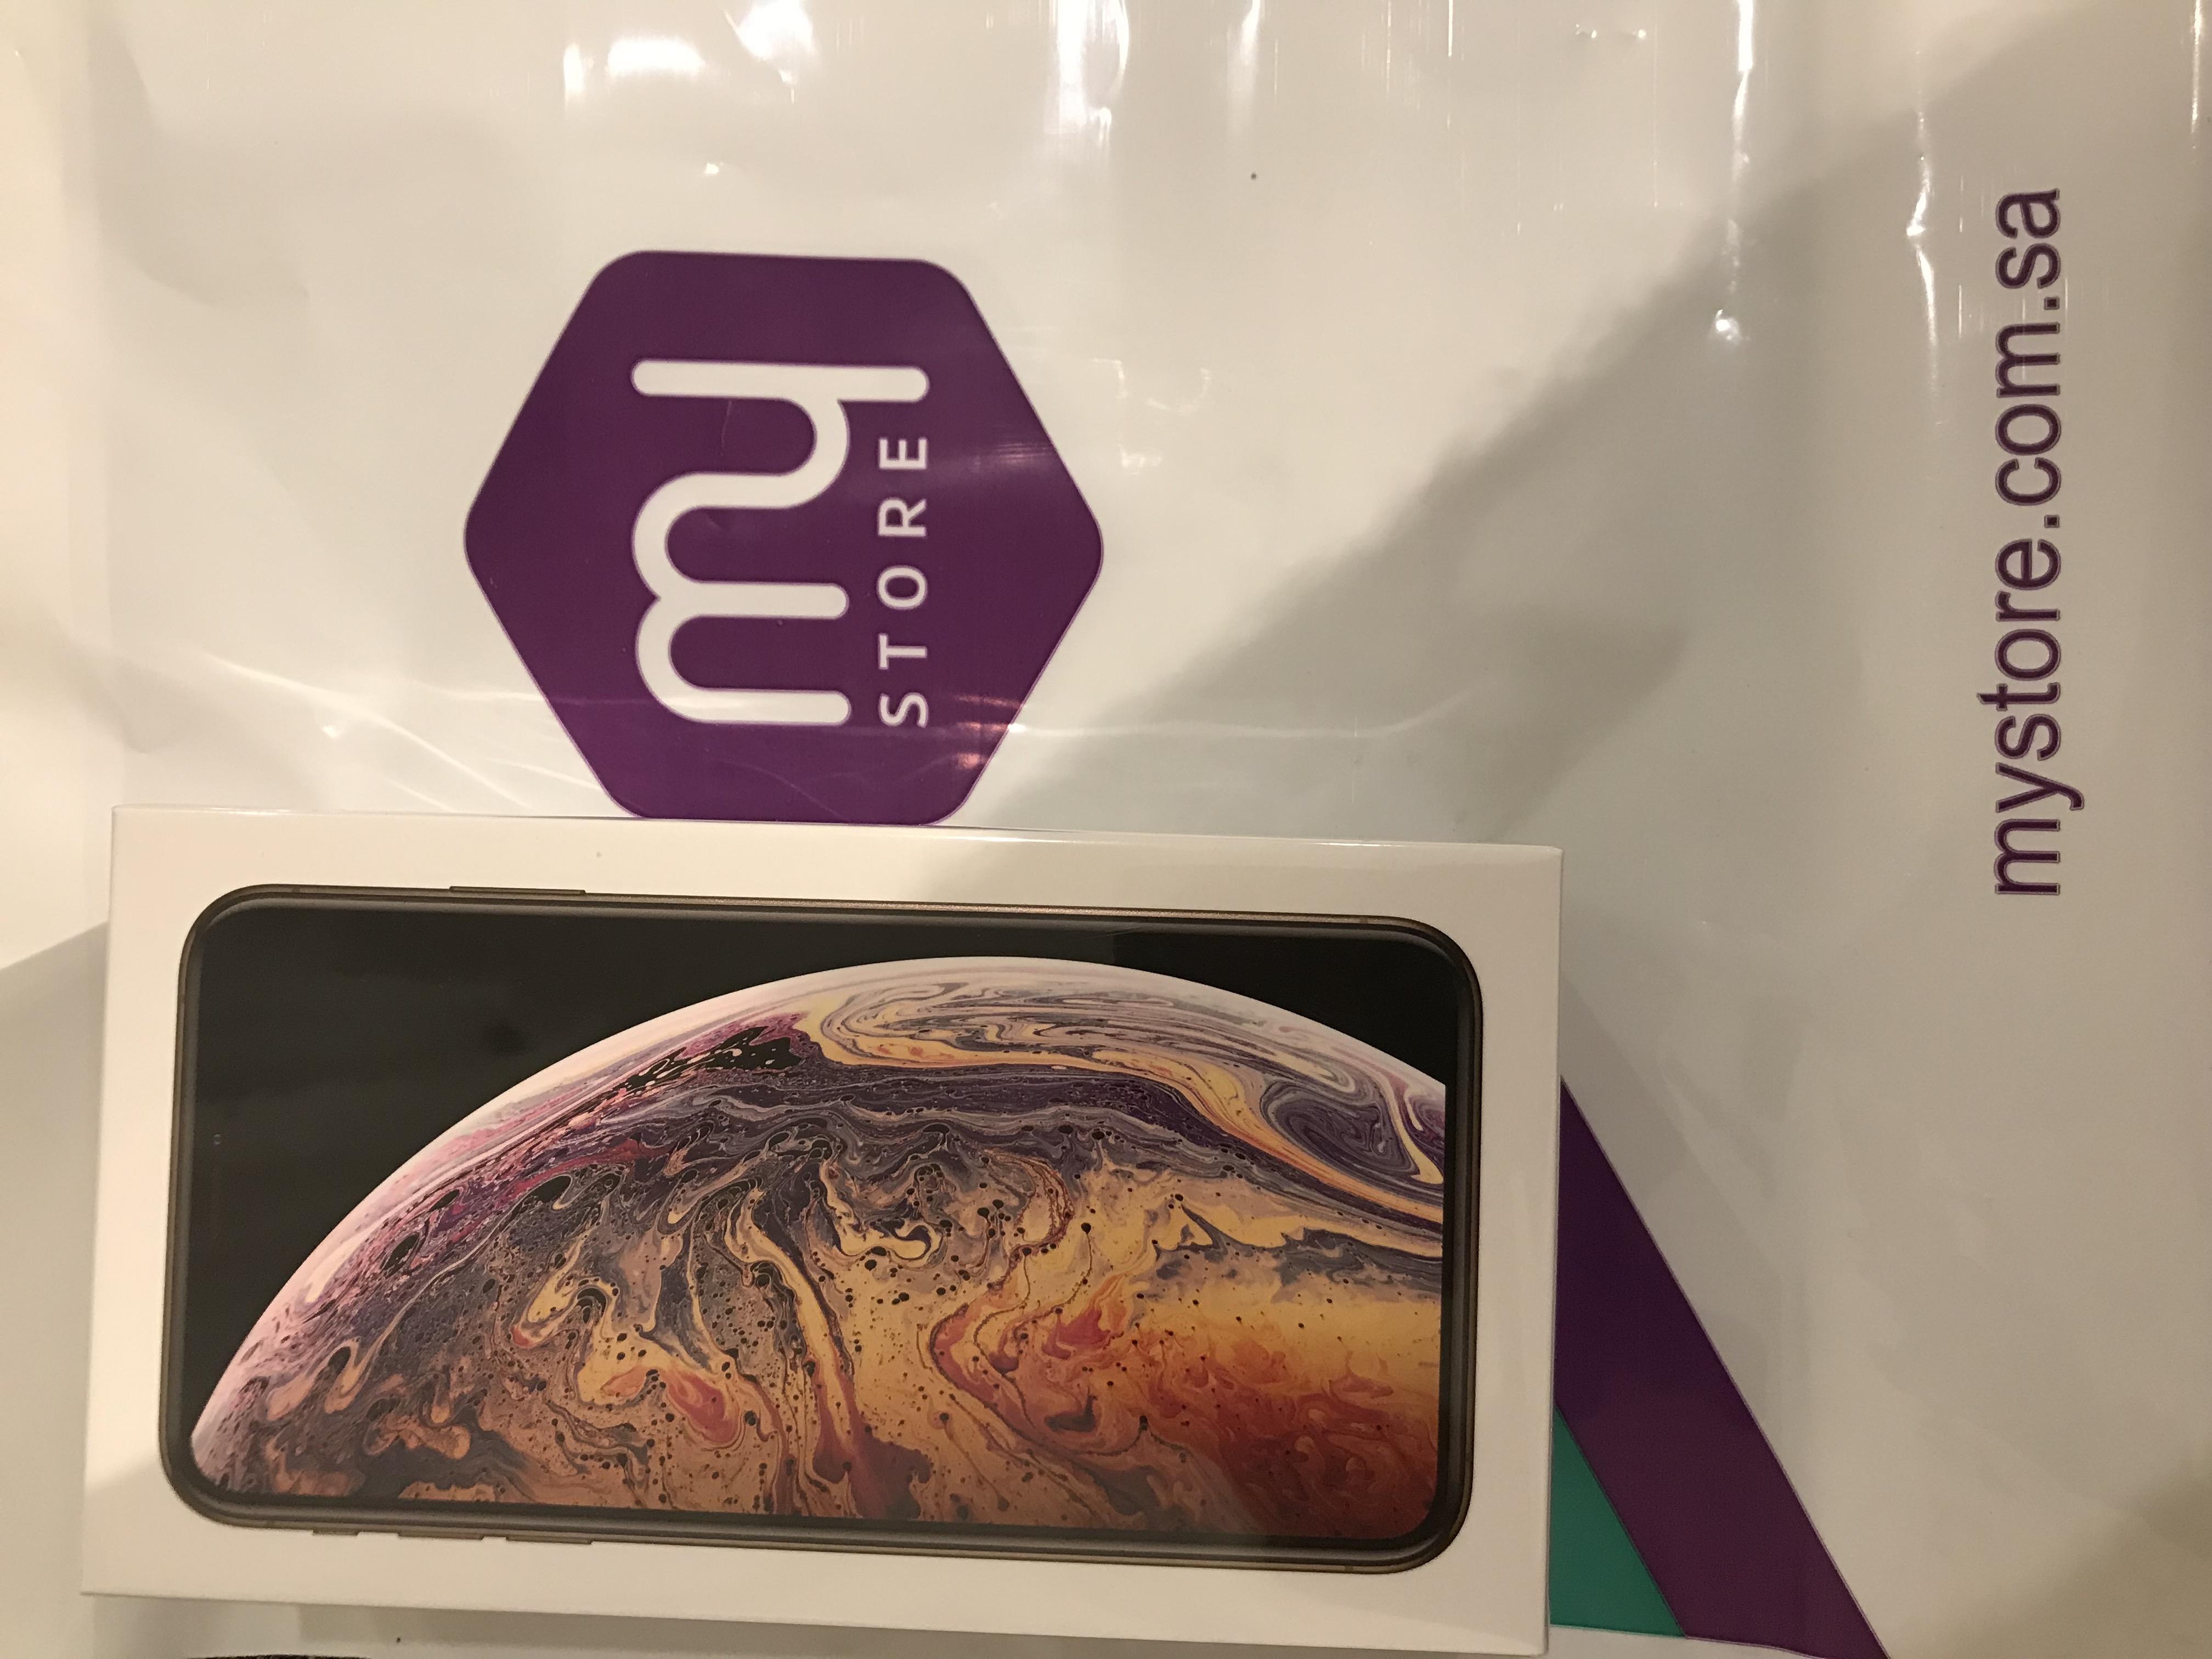 تجربتي في شراء iPhone XS Max 256GB بسعر مخفض جداً 4199 ريال من ماي ستور